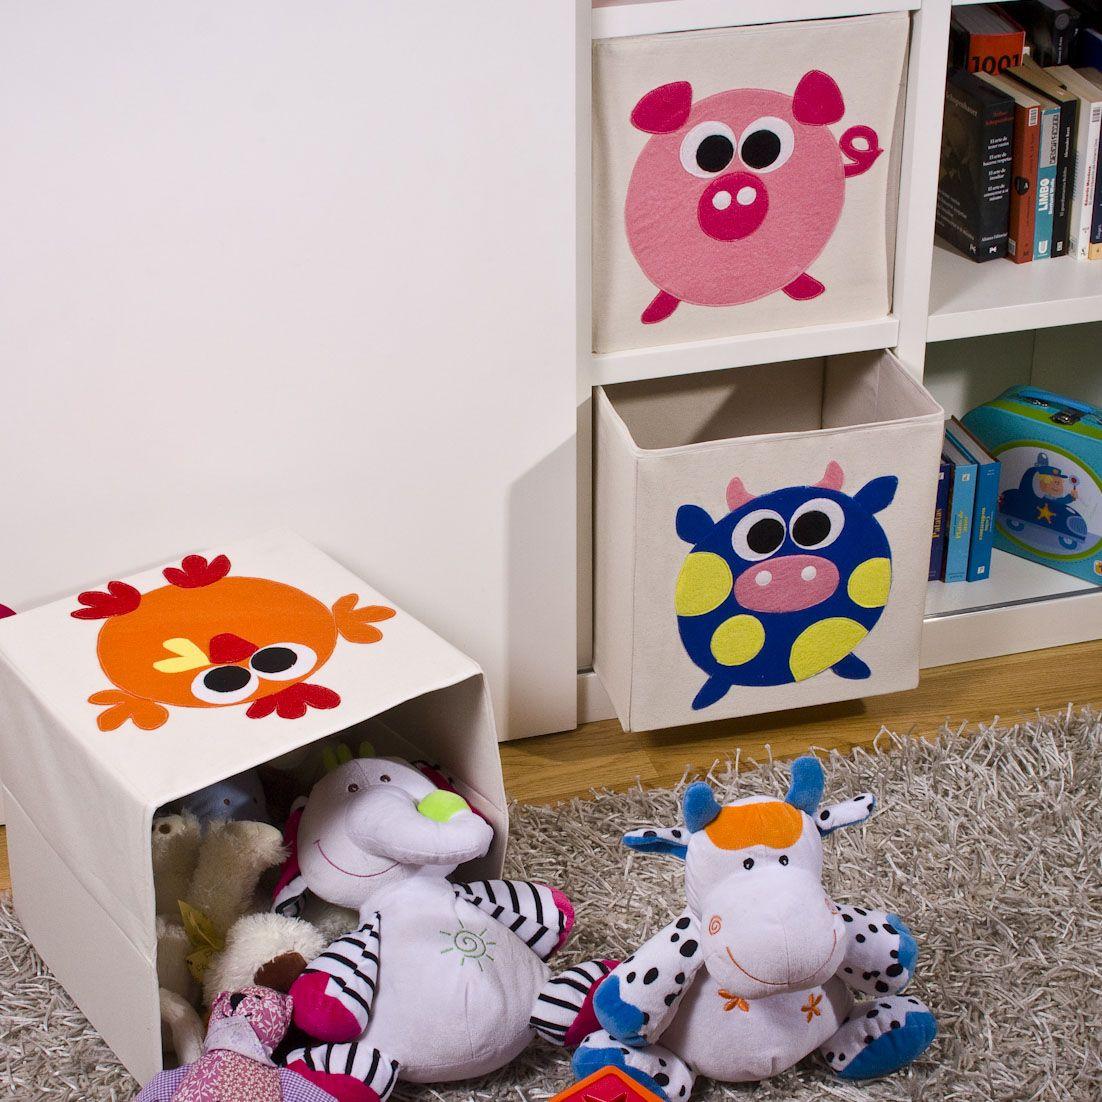 Cajas de alamacenaje infantil la granja en cajas de almacenaje diy furniture - Caja almacenaje infantil ...